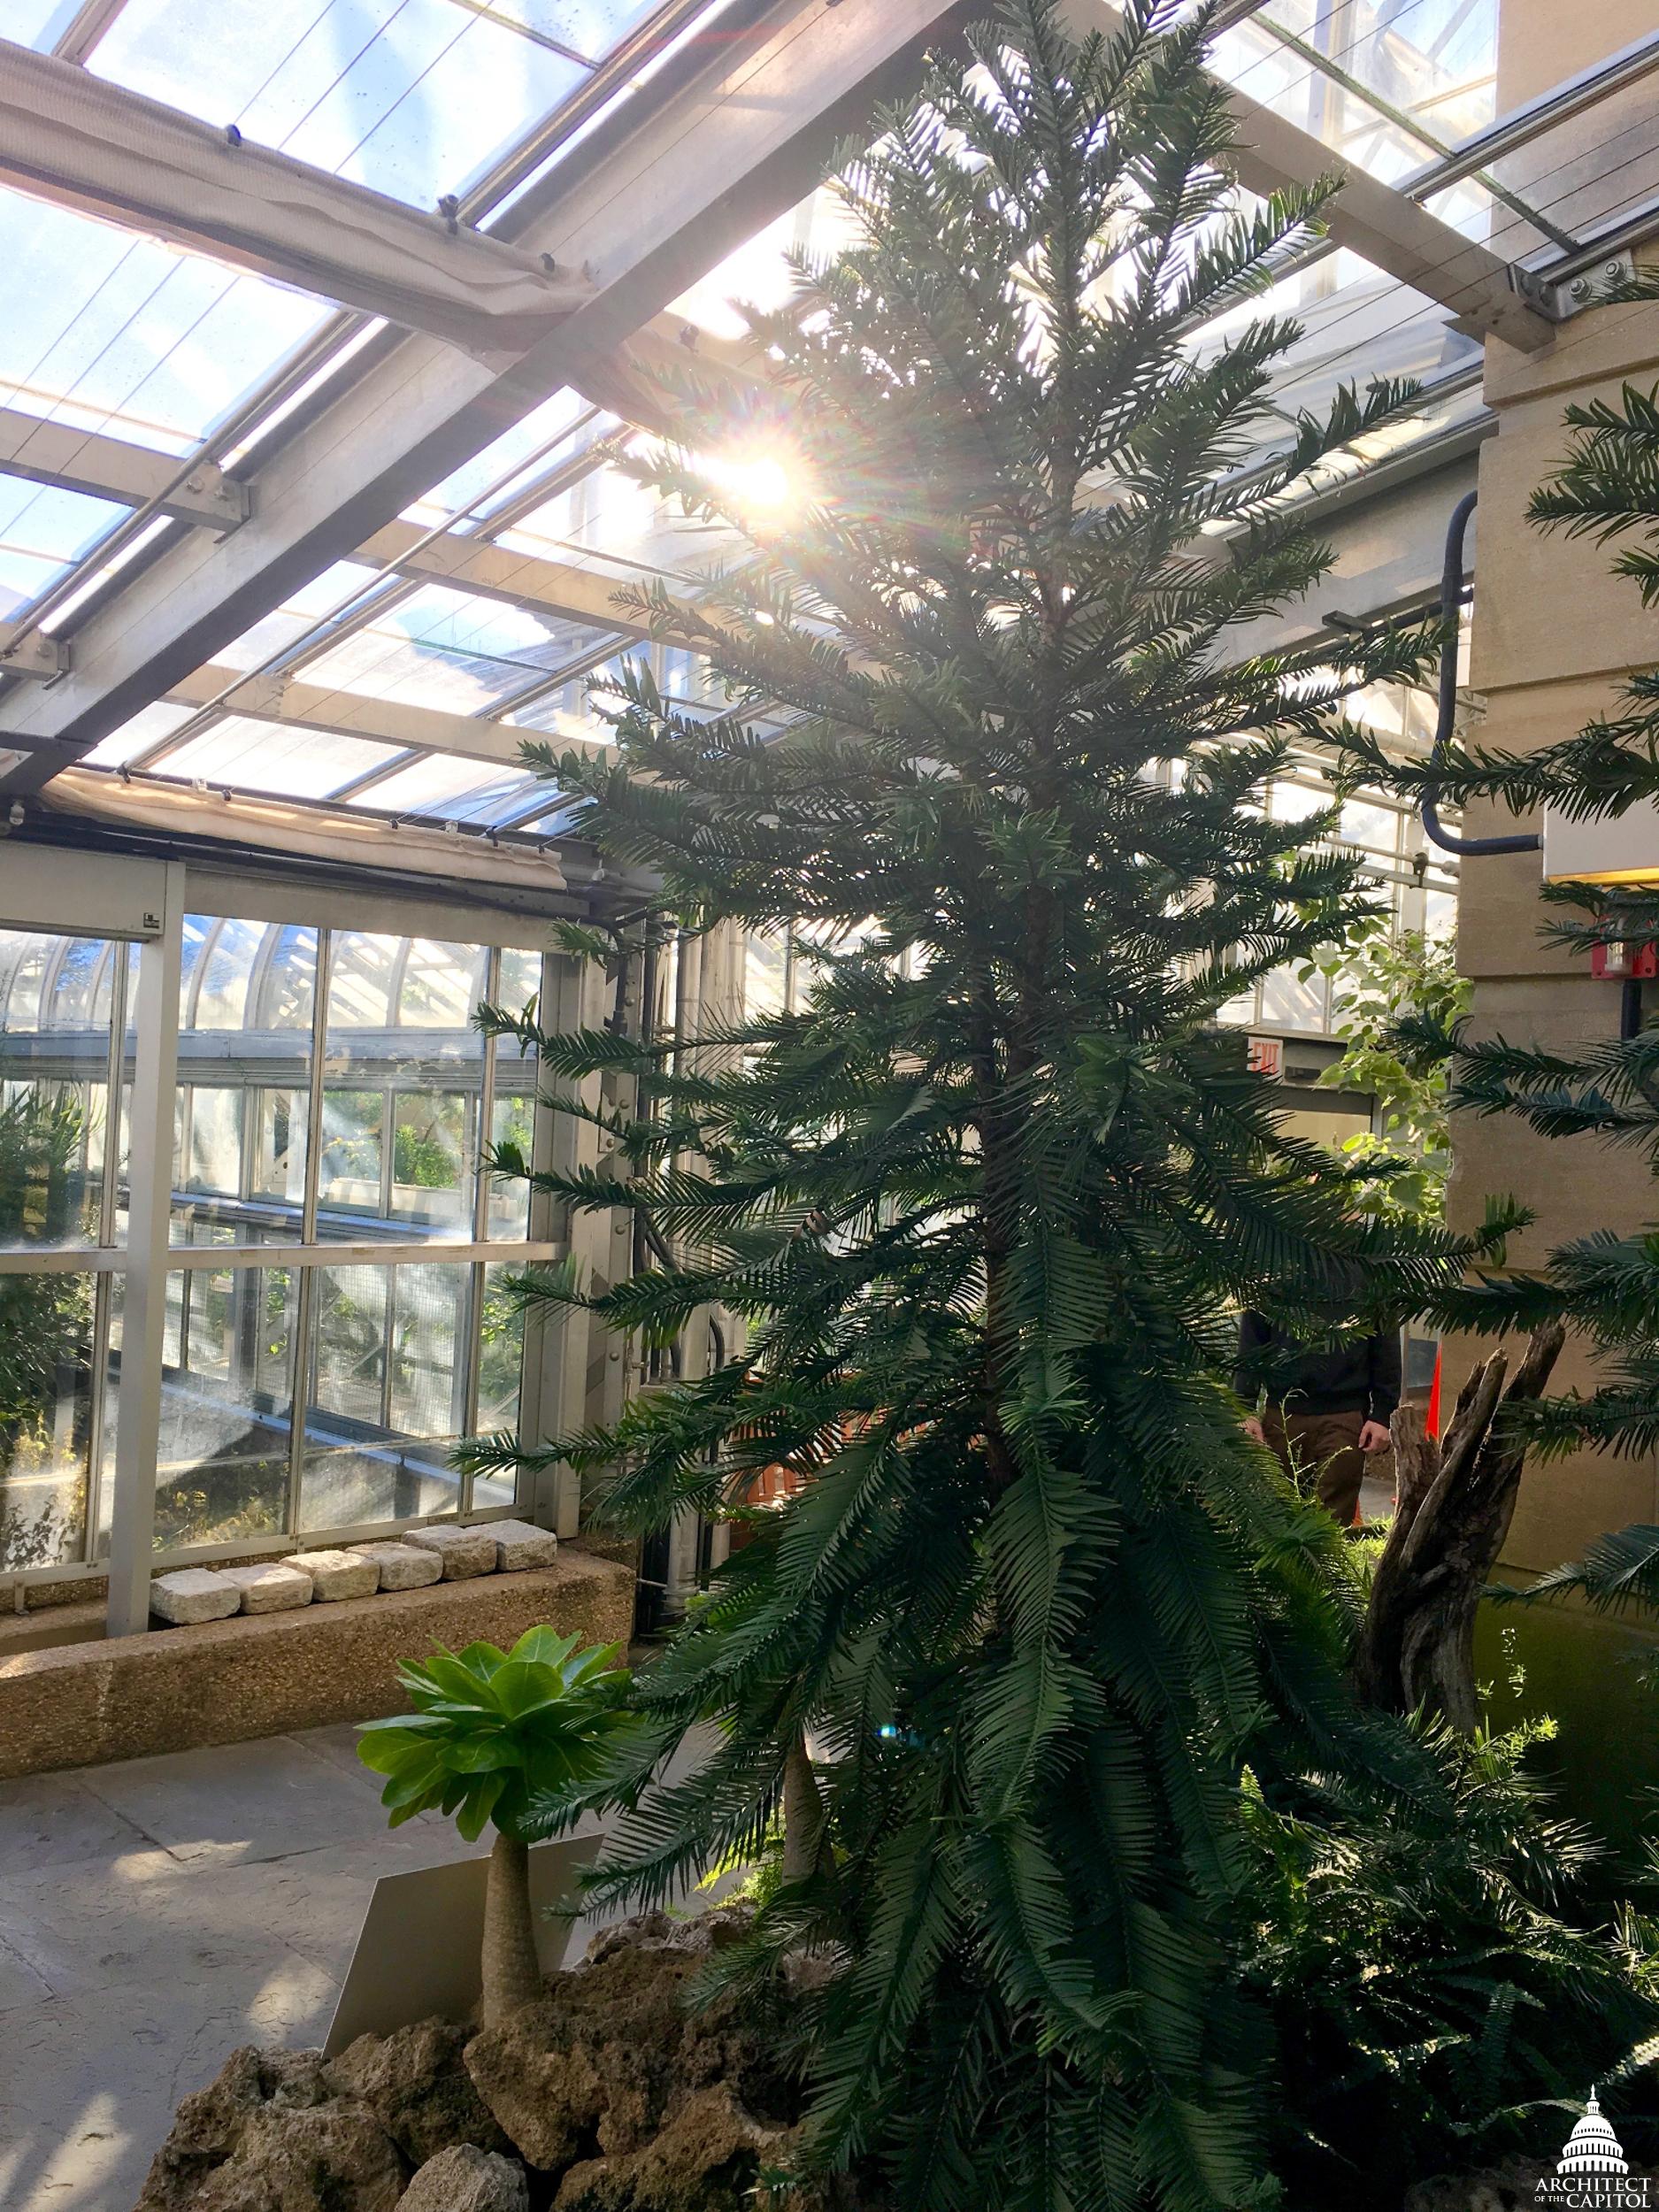 The U.S. Botanic Garden's Wollemi pine.